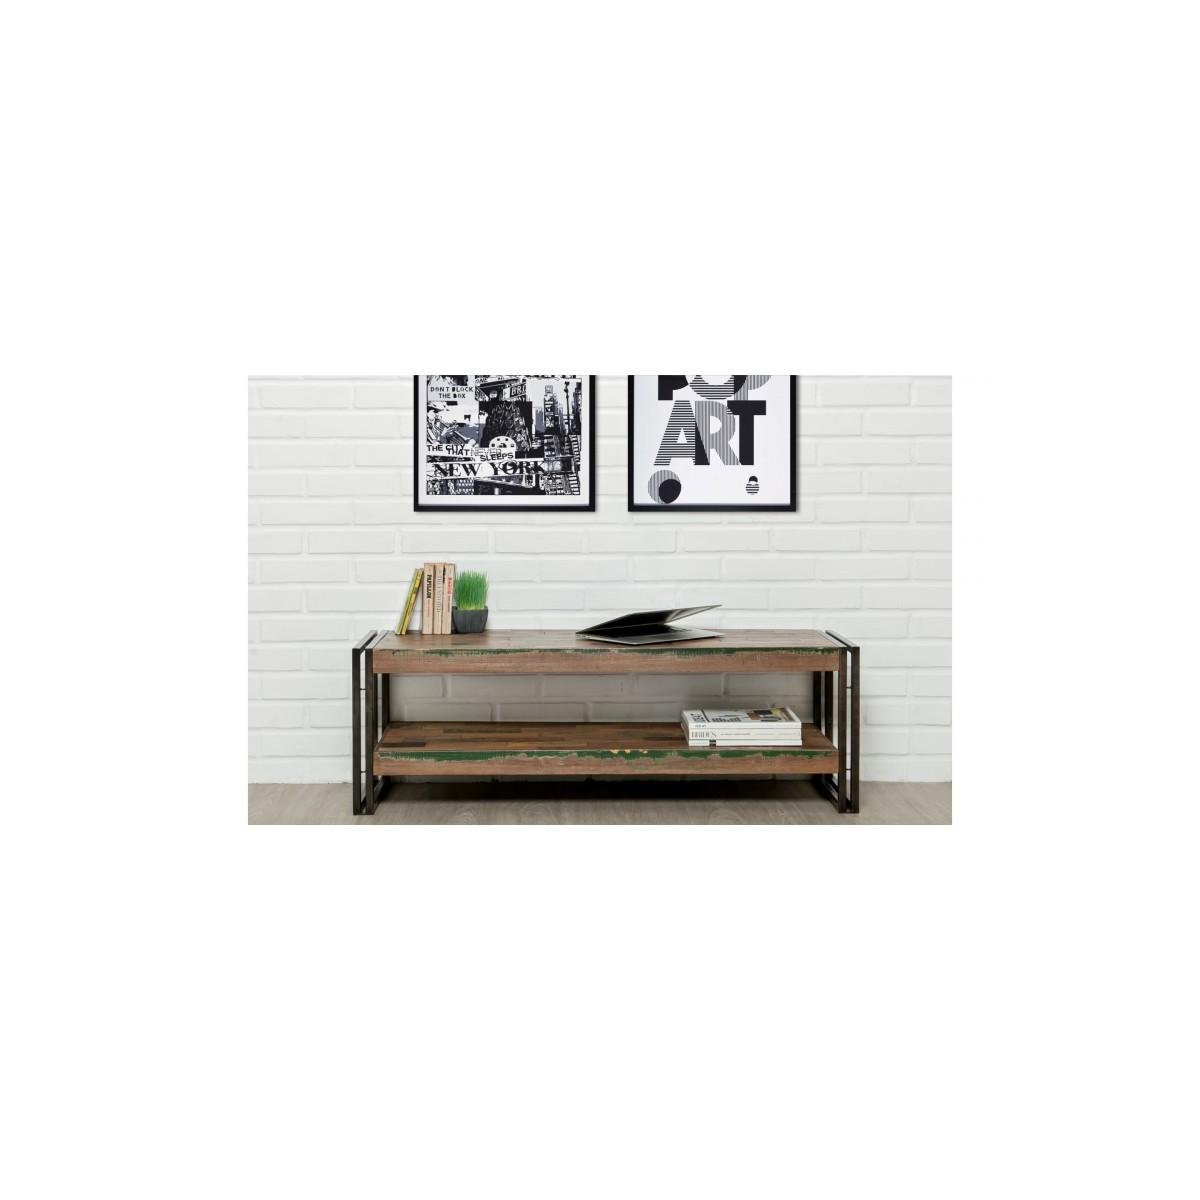 niedrige tv 2 industrielle schalen 120 cm noah massiven teak recycelt und metall stehen amp story 5415